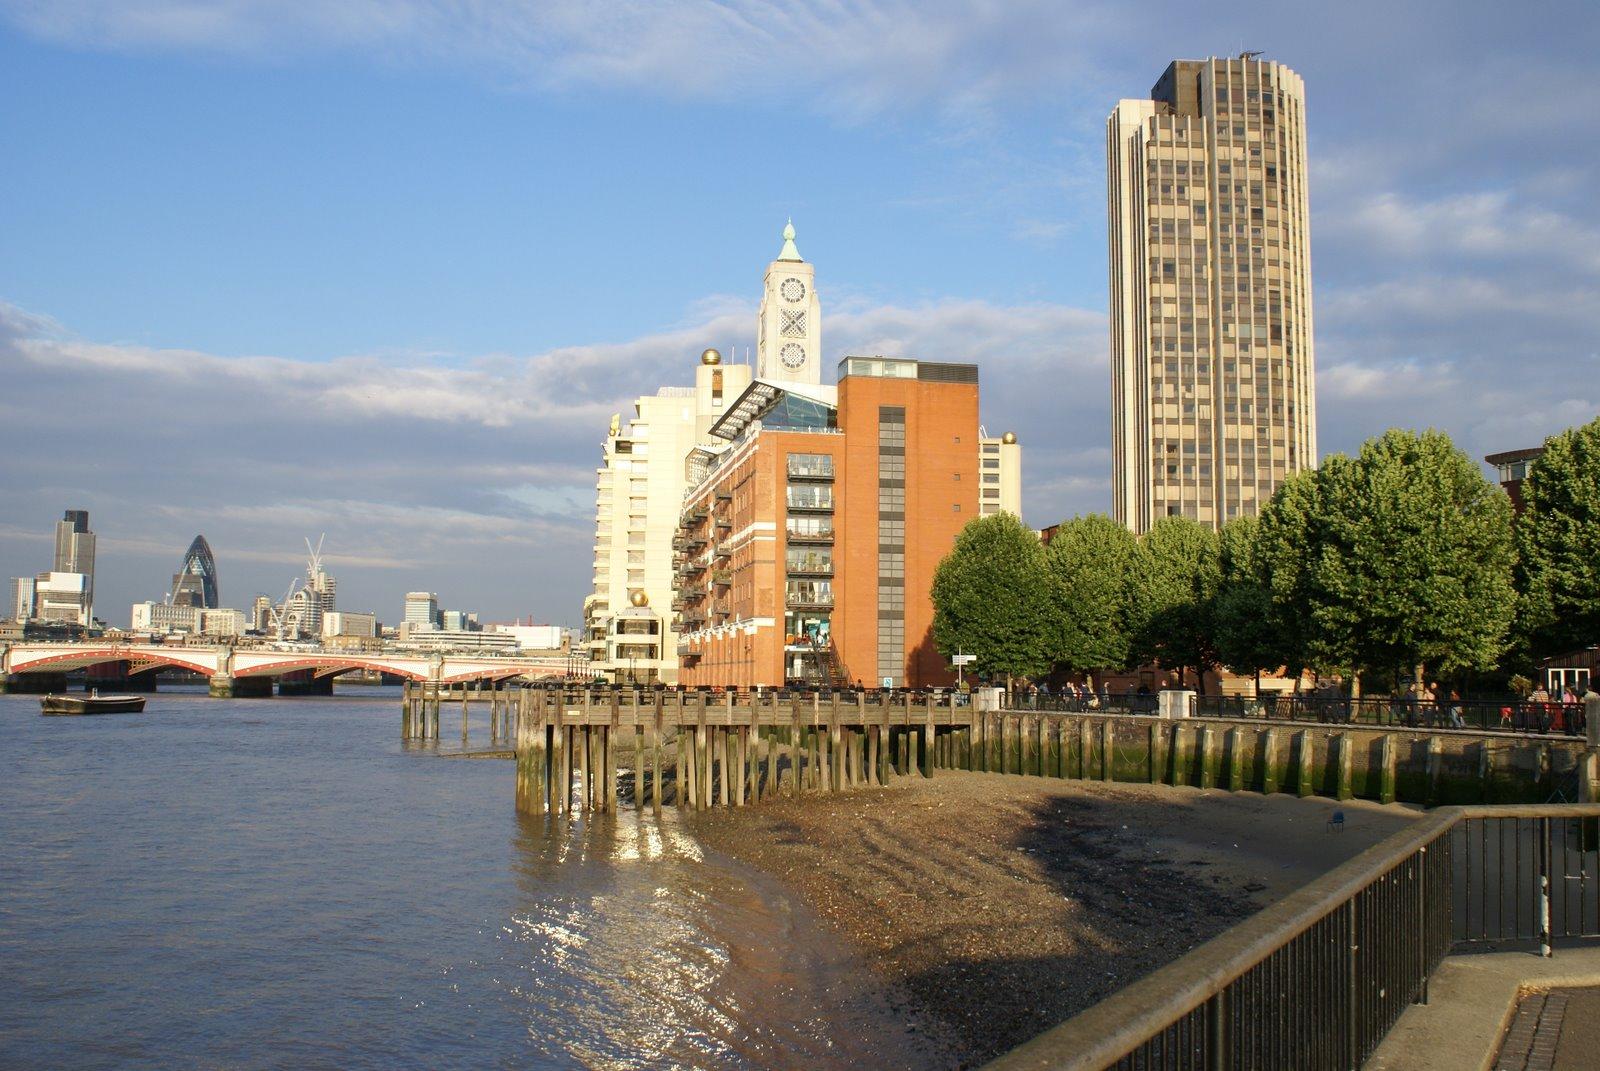 De la Torre Oxo al Puente de la Torre de Londres